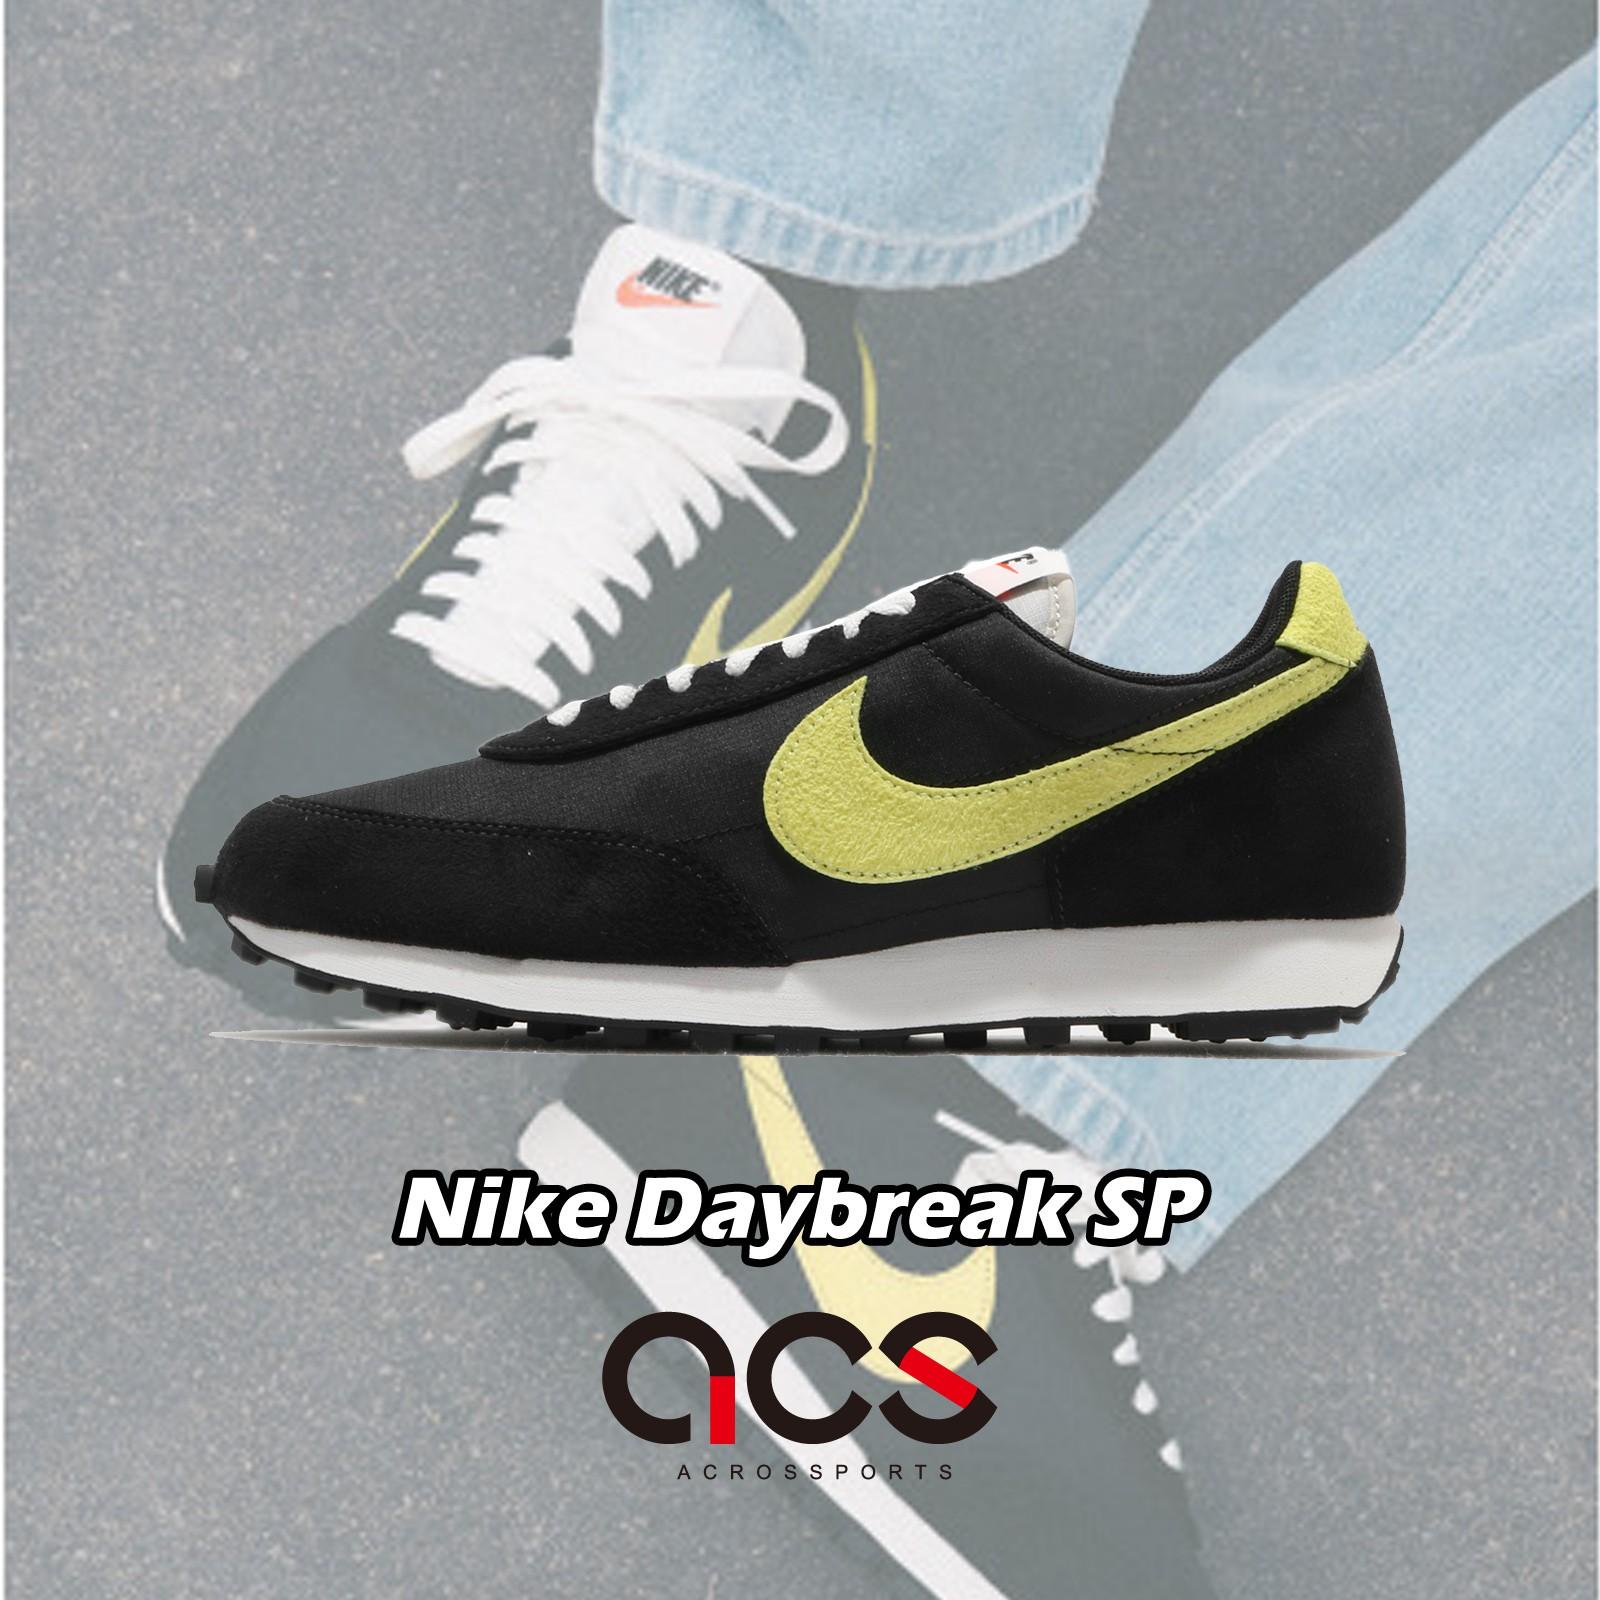 Nike 休閒鞋 Dbreak SP 黑 黃 男鞋 復古 Daybreak 麂皮【ACS】 DA0824-001